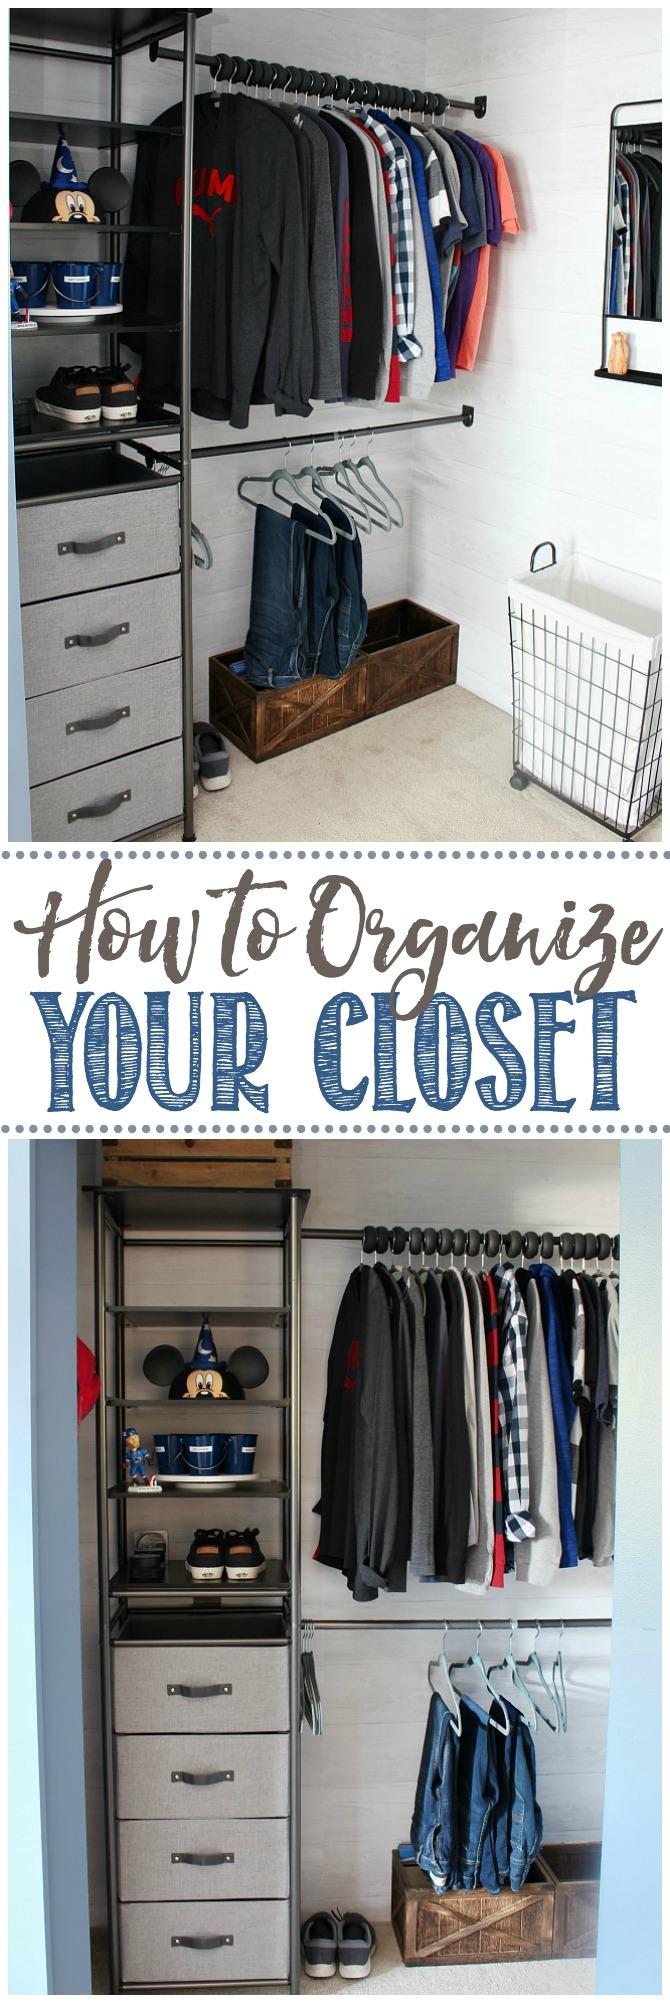 Organized teen bedroom clothes closet using a modular closet organizer.